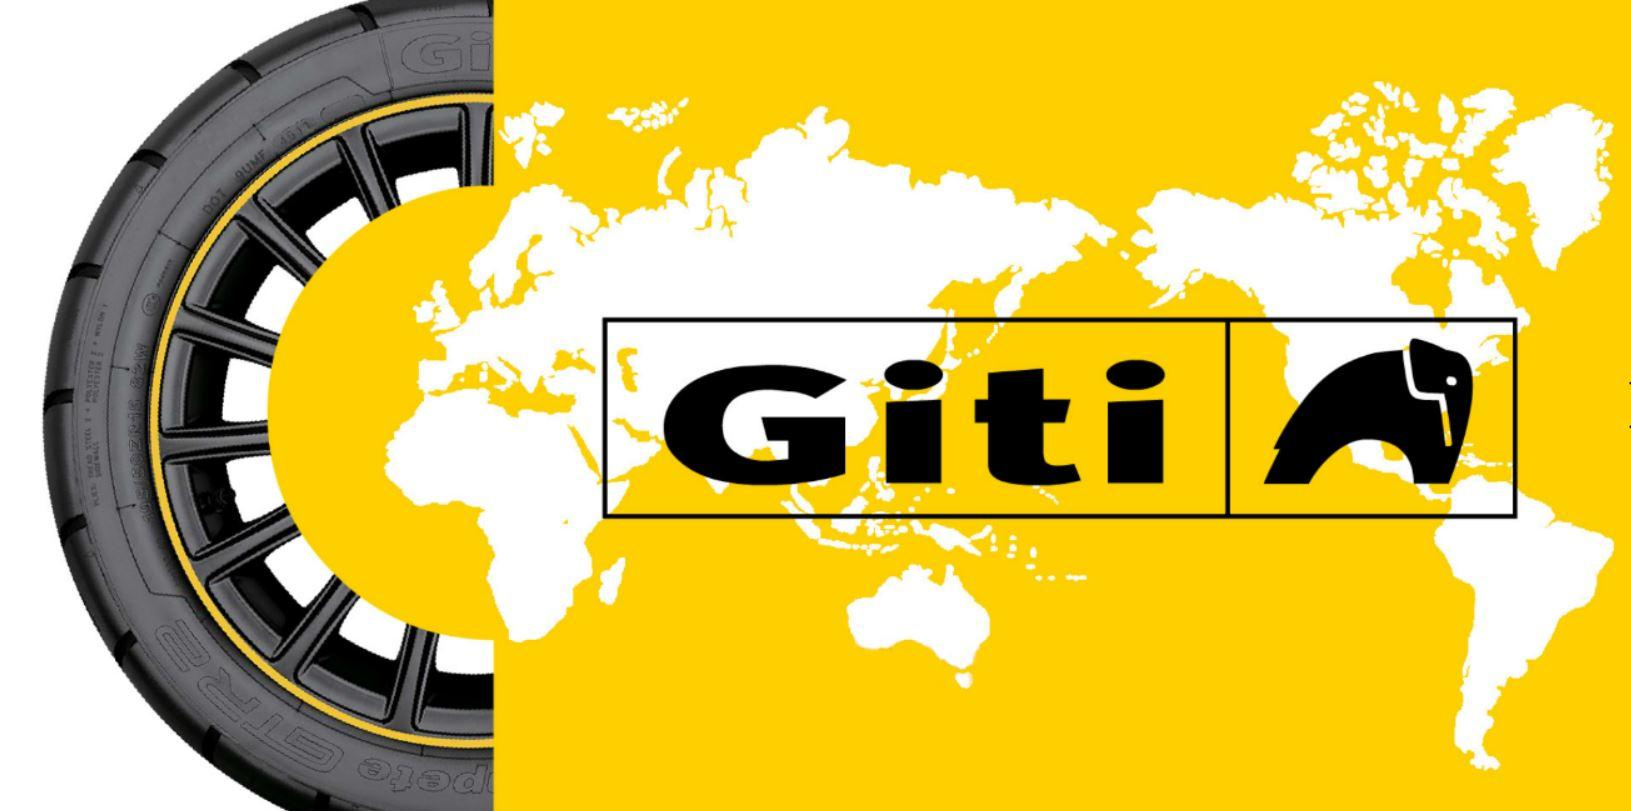 (P) Descopera marca de anvelope GITI